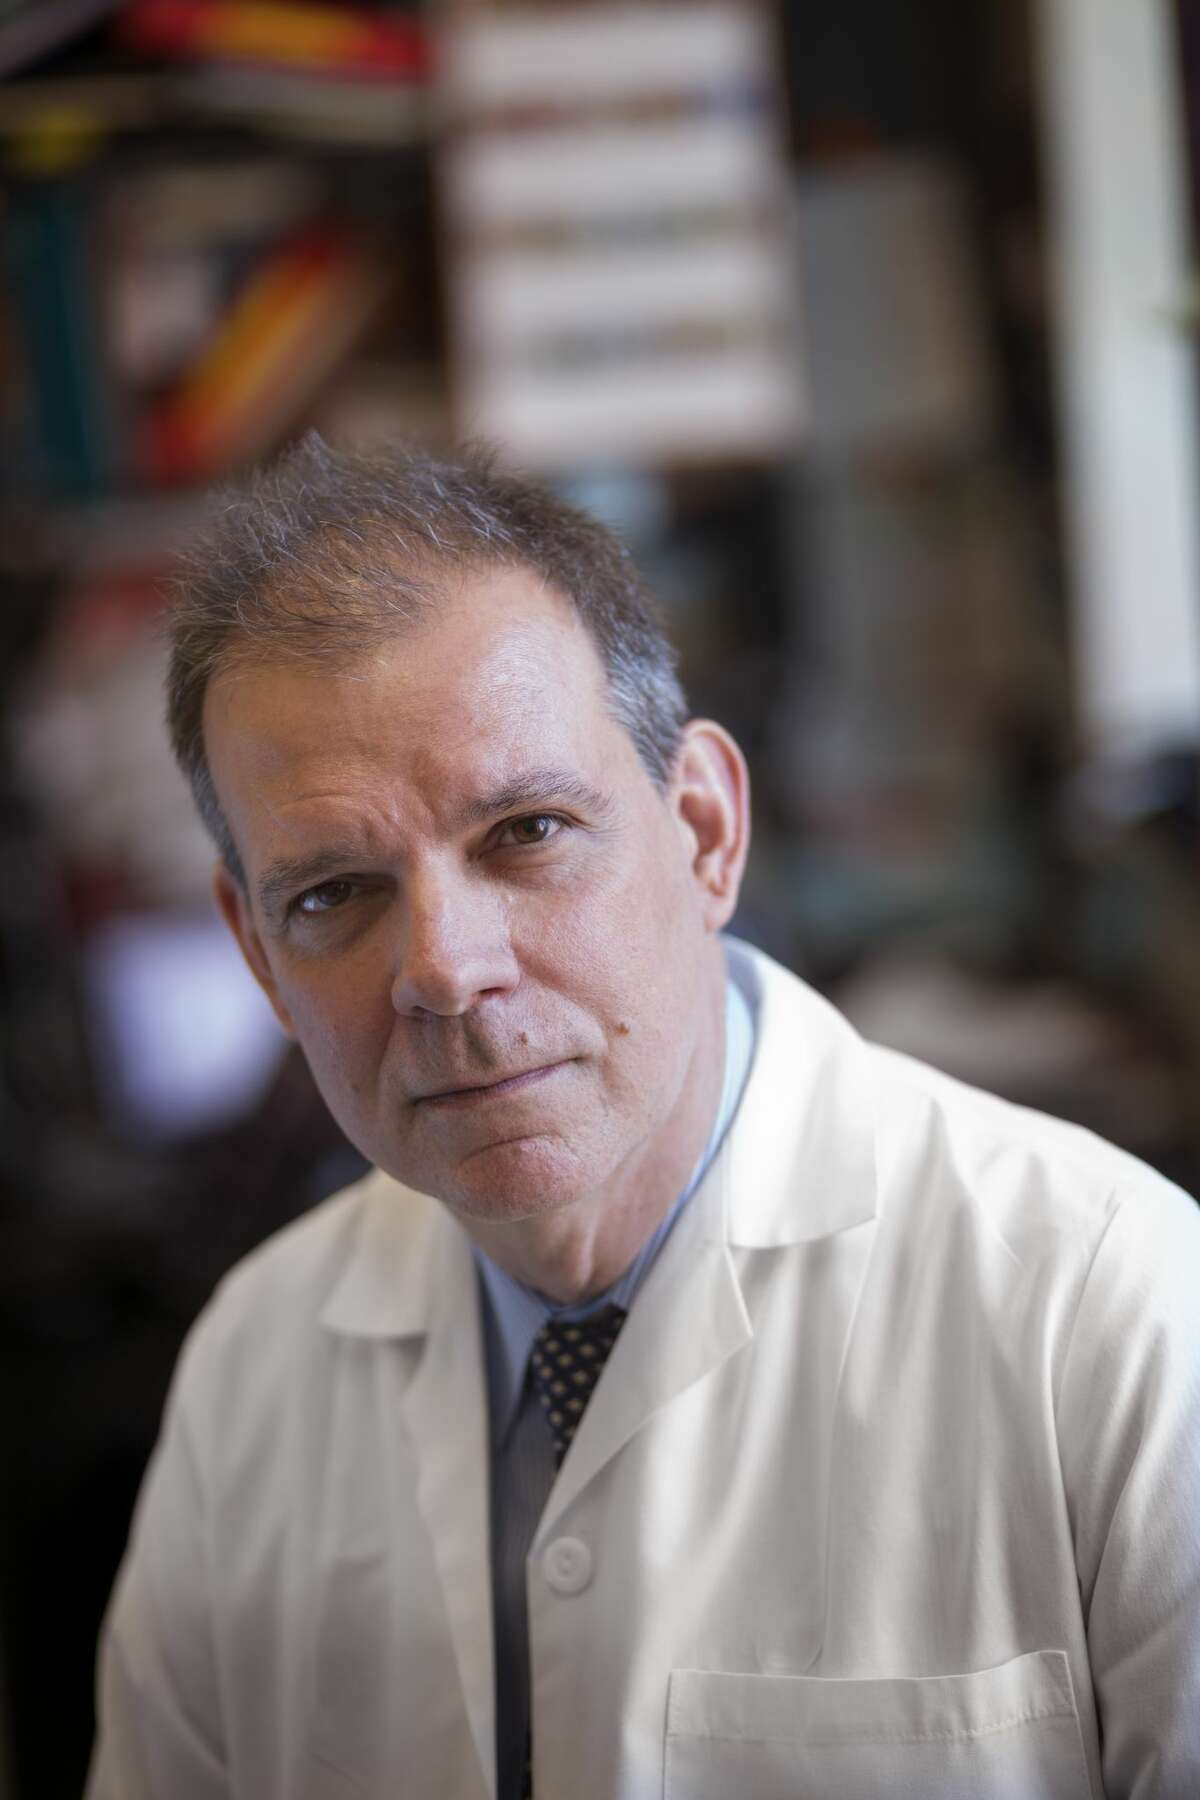 El doctor Arturo Casadevall, de Johns Hopkins University.